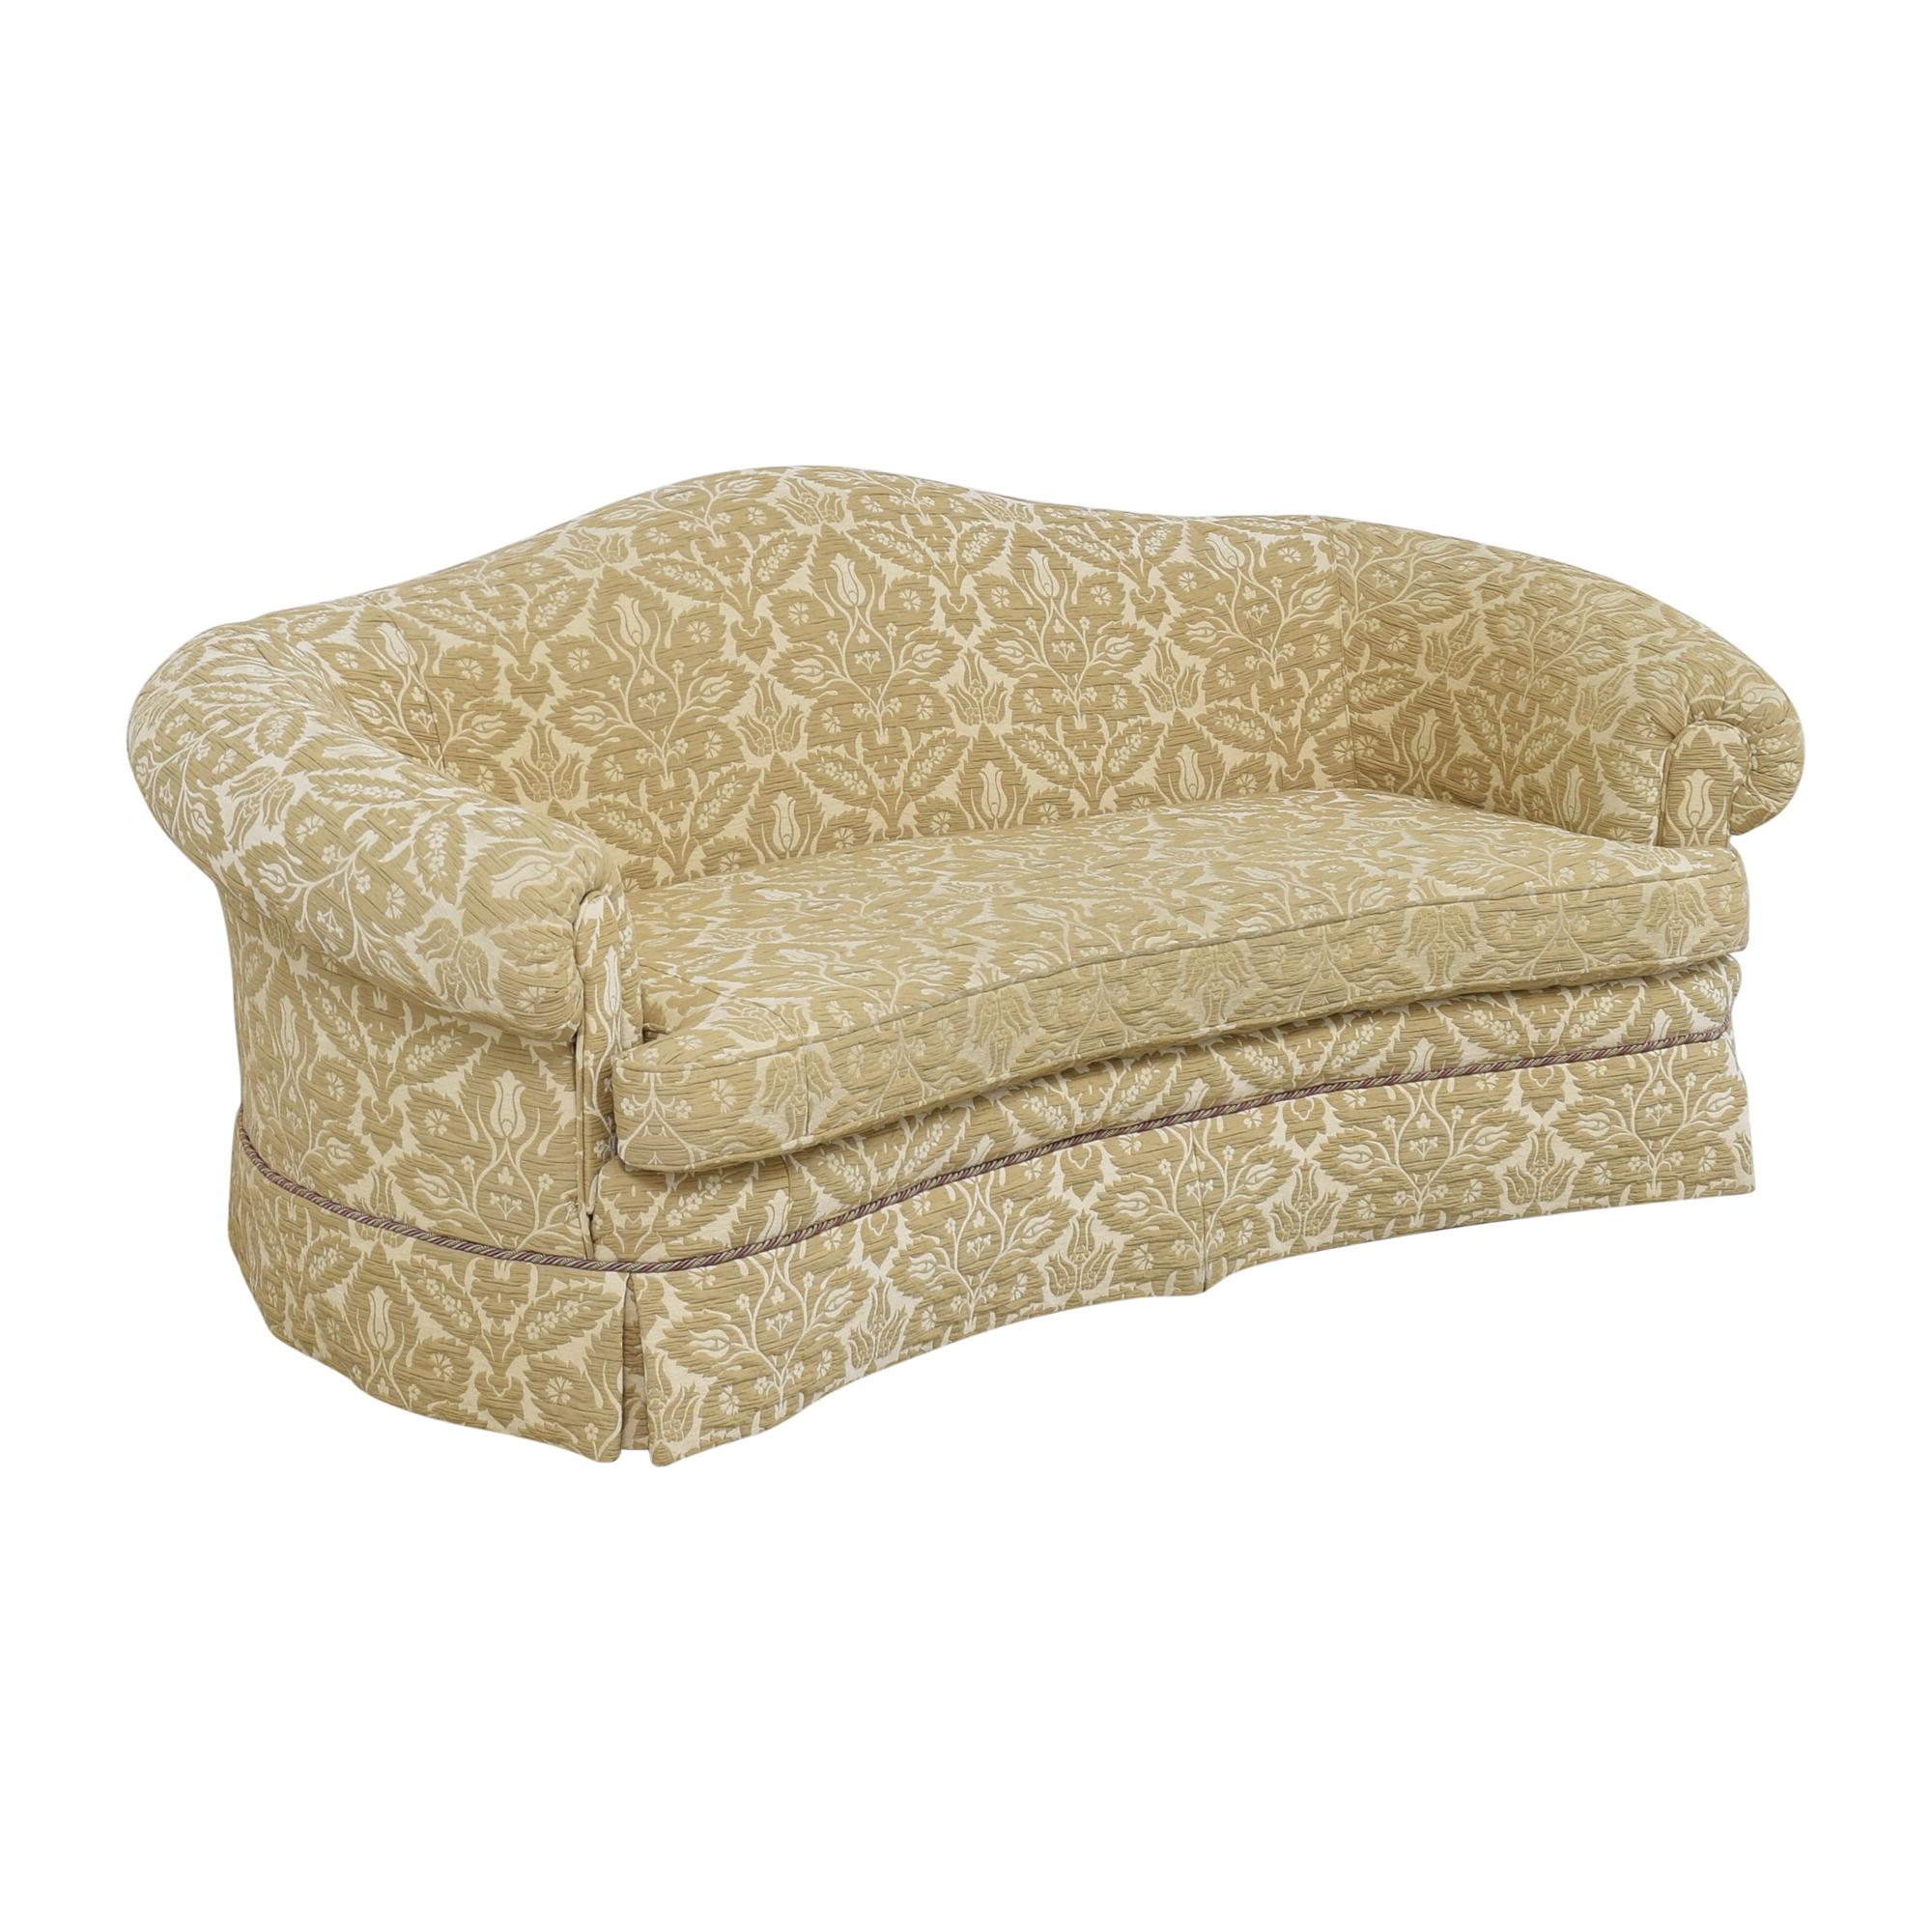 Sherrill Furniture Sherrill Furniture Curved Camel Back Sofa on sale